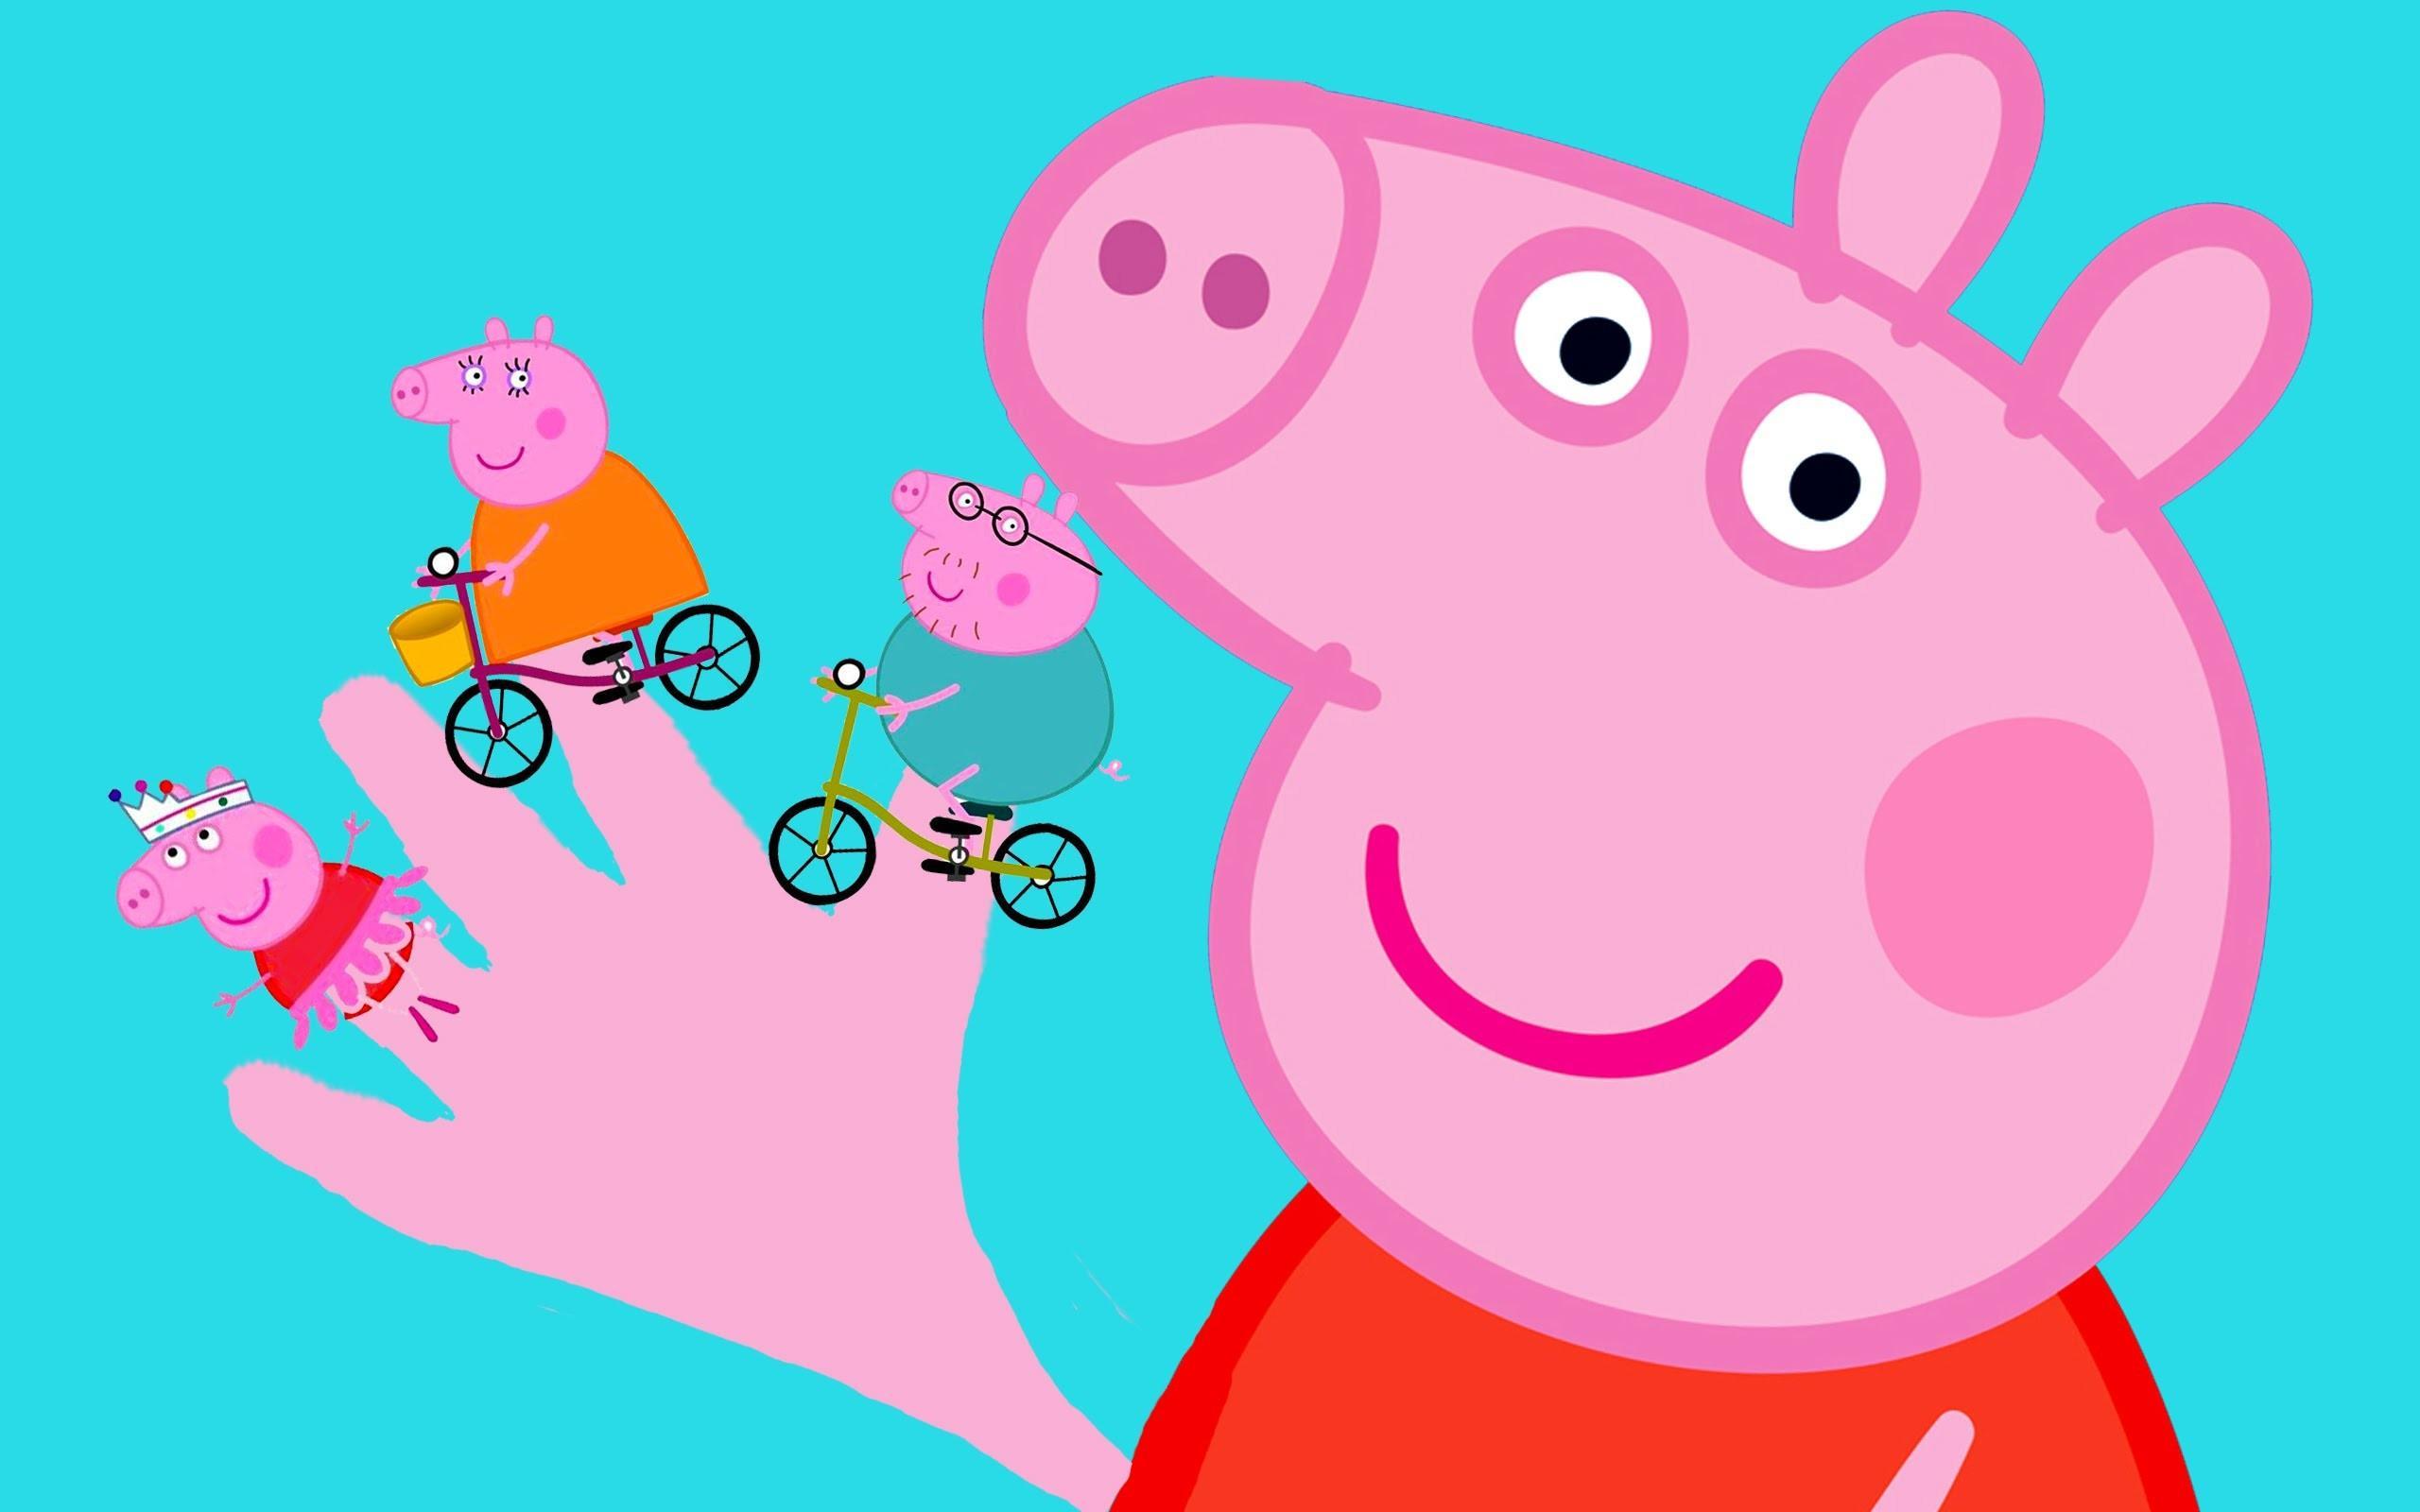 Peppa Pig 4K Wallpapers - Wallpaper Cave